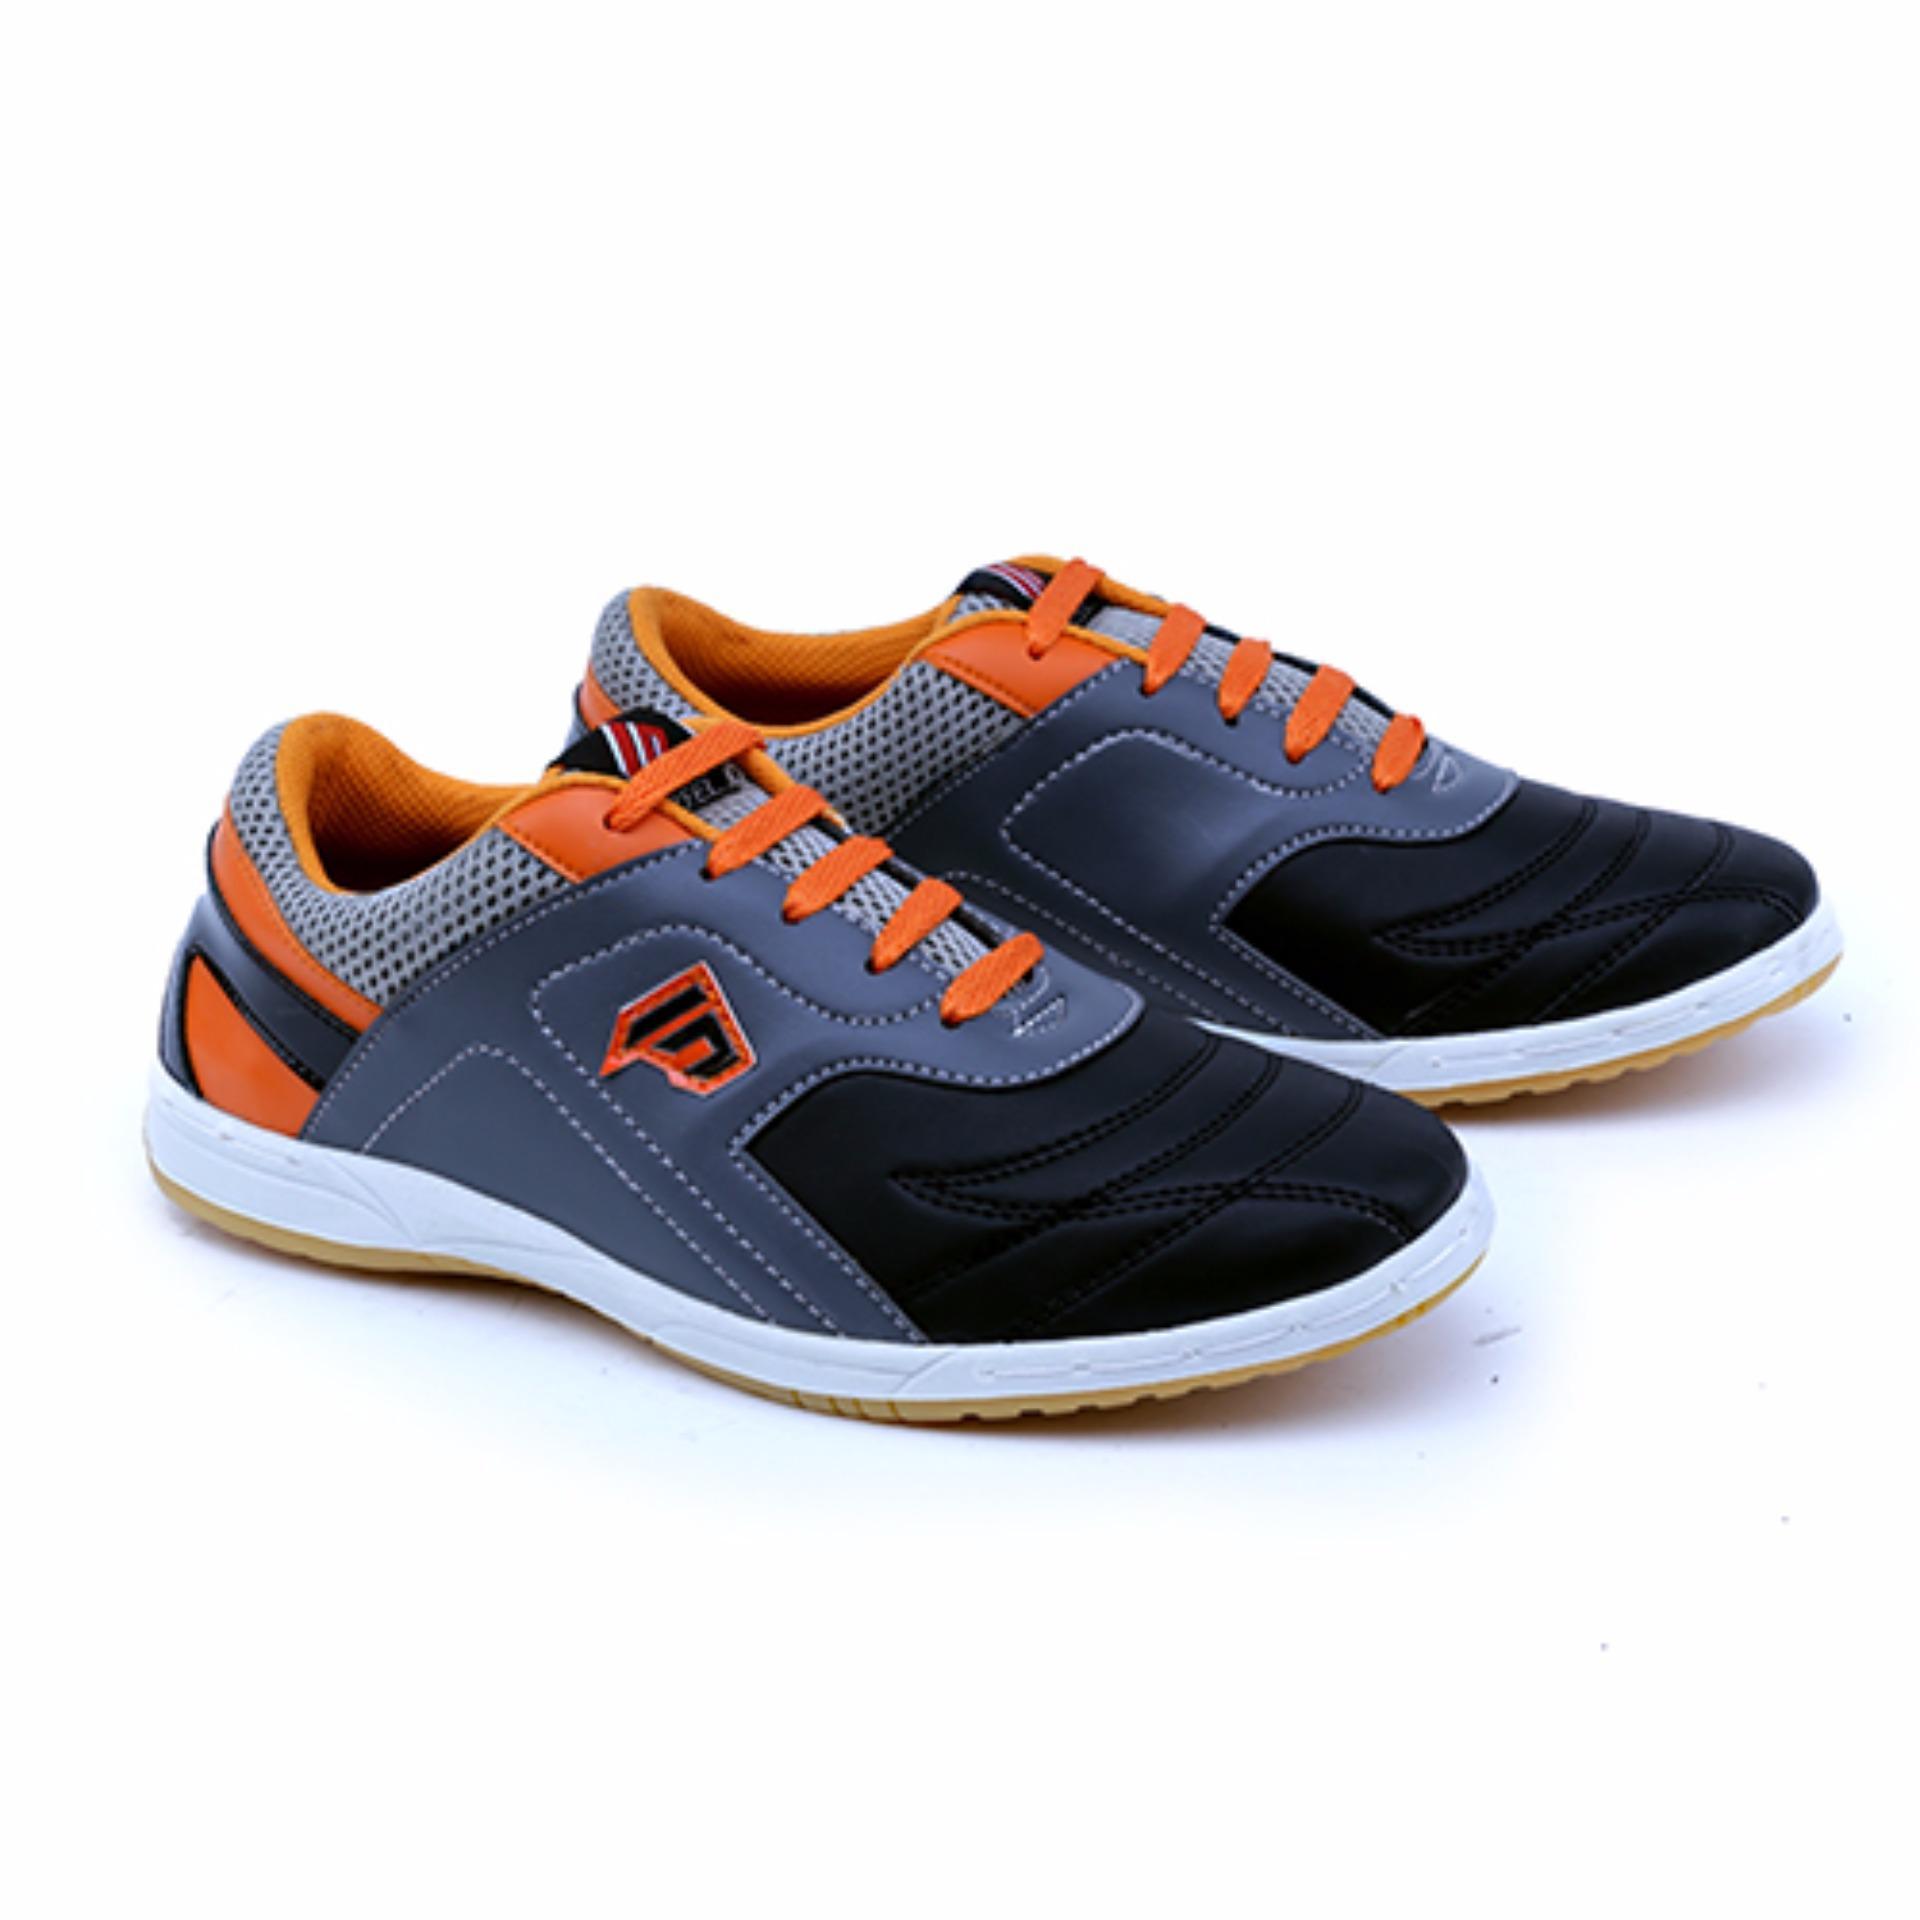 Fashionable Garsel Sepatu Olahraga Futsal Shoes Pria GRG 7506 Bahan Synth